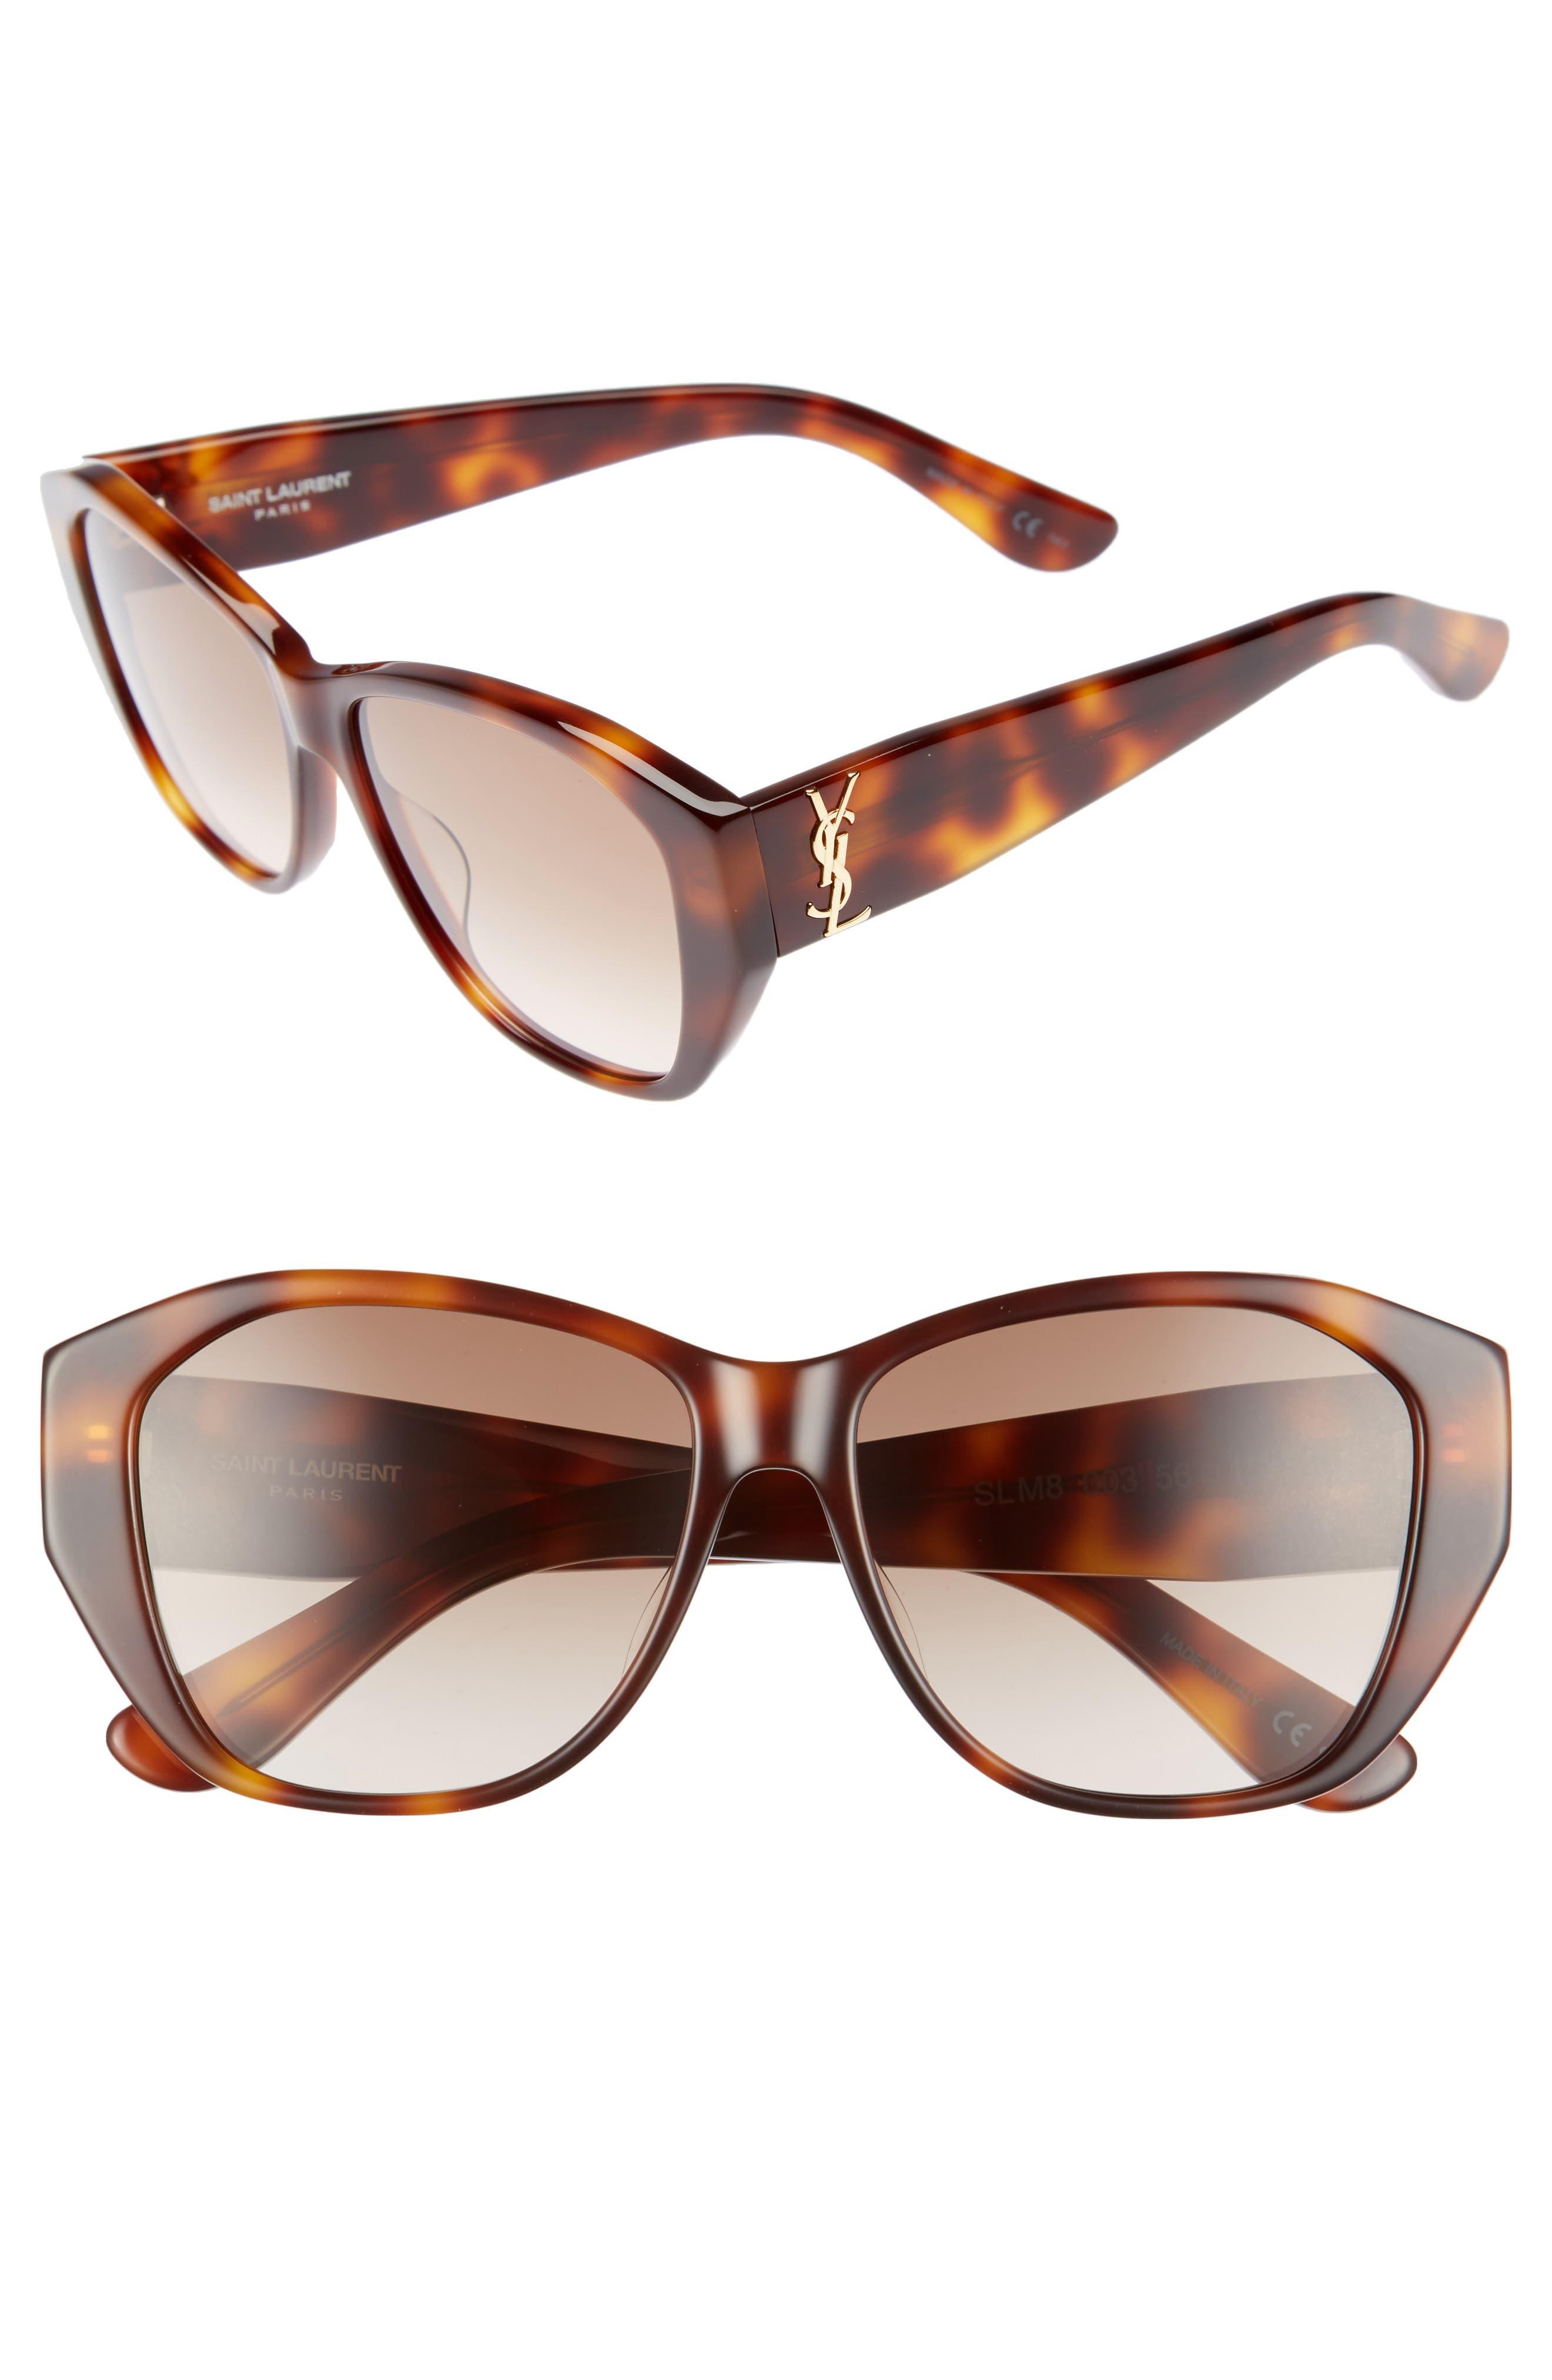 56mm Sunglasses,                         Main,                         color, Havana/ Havana/ Brown